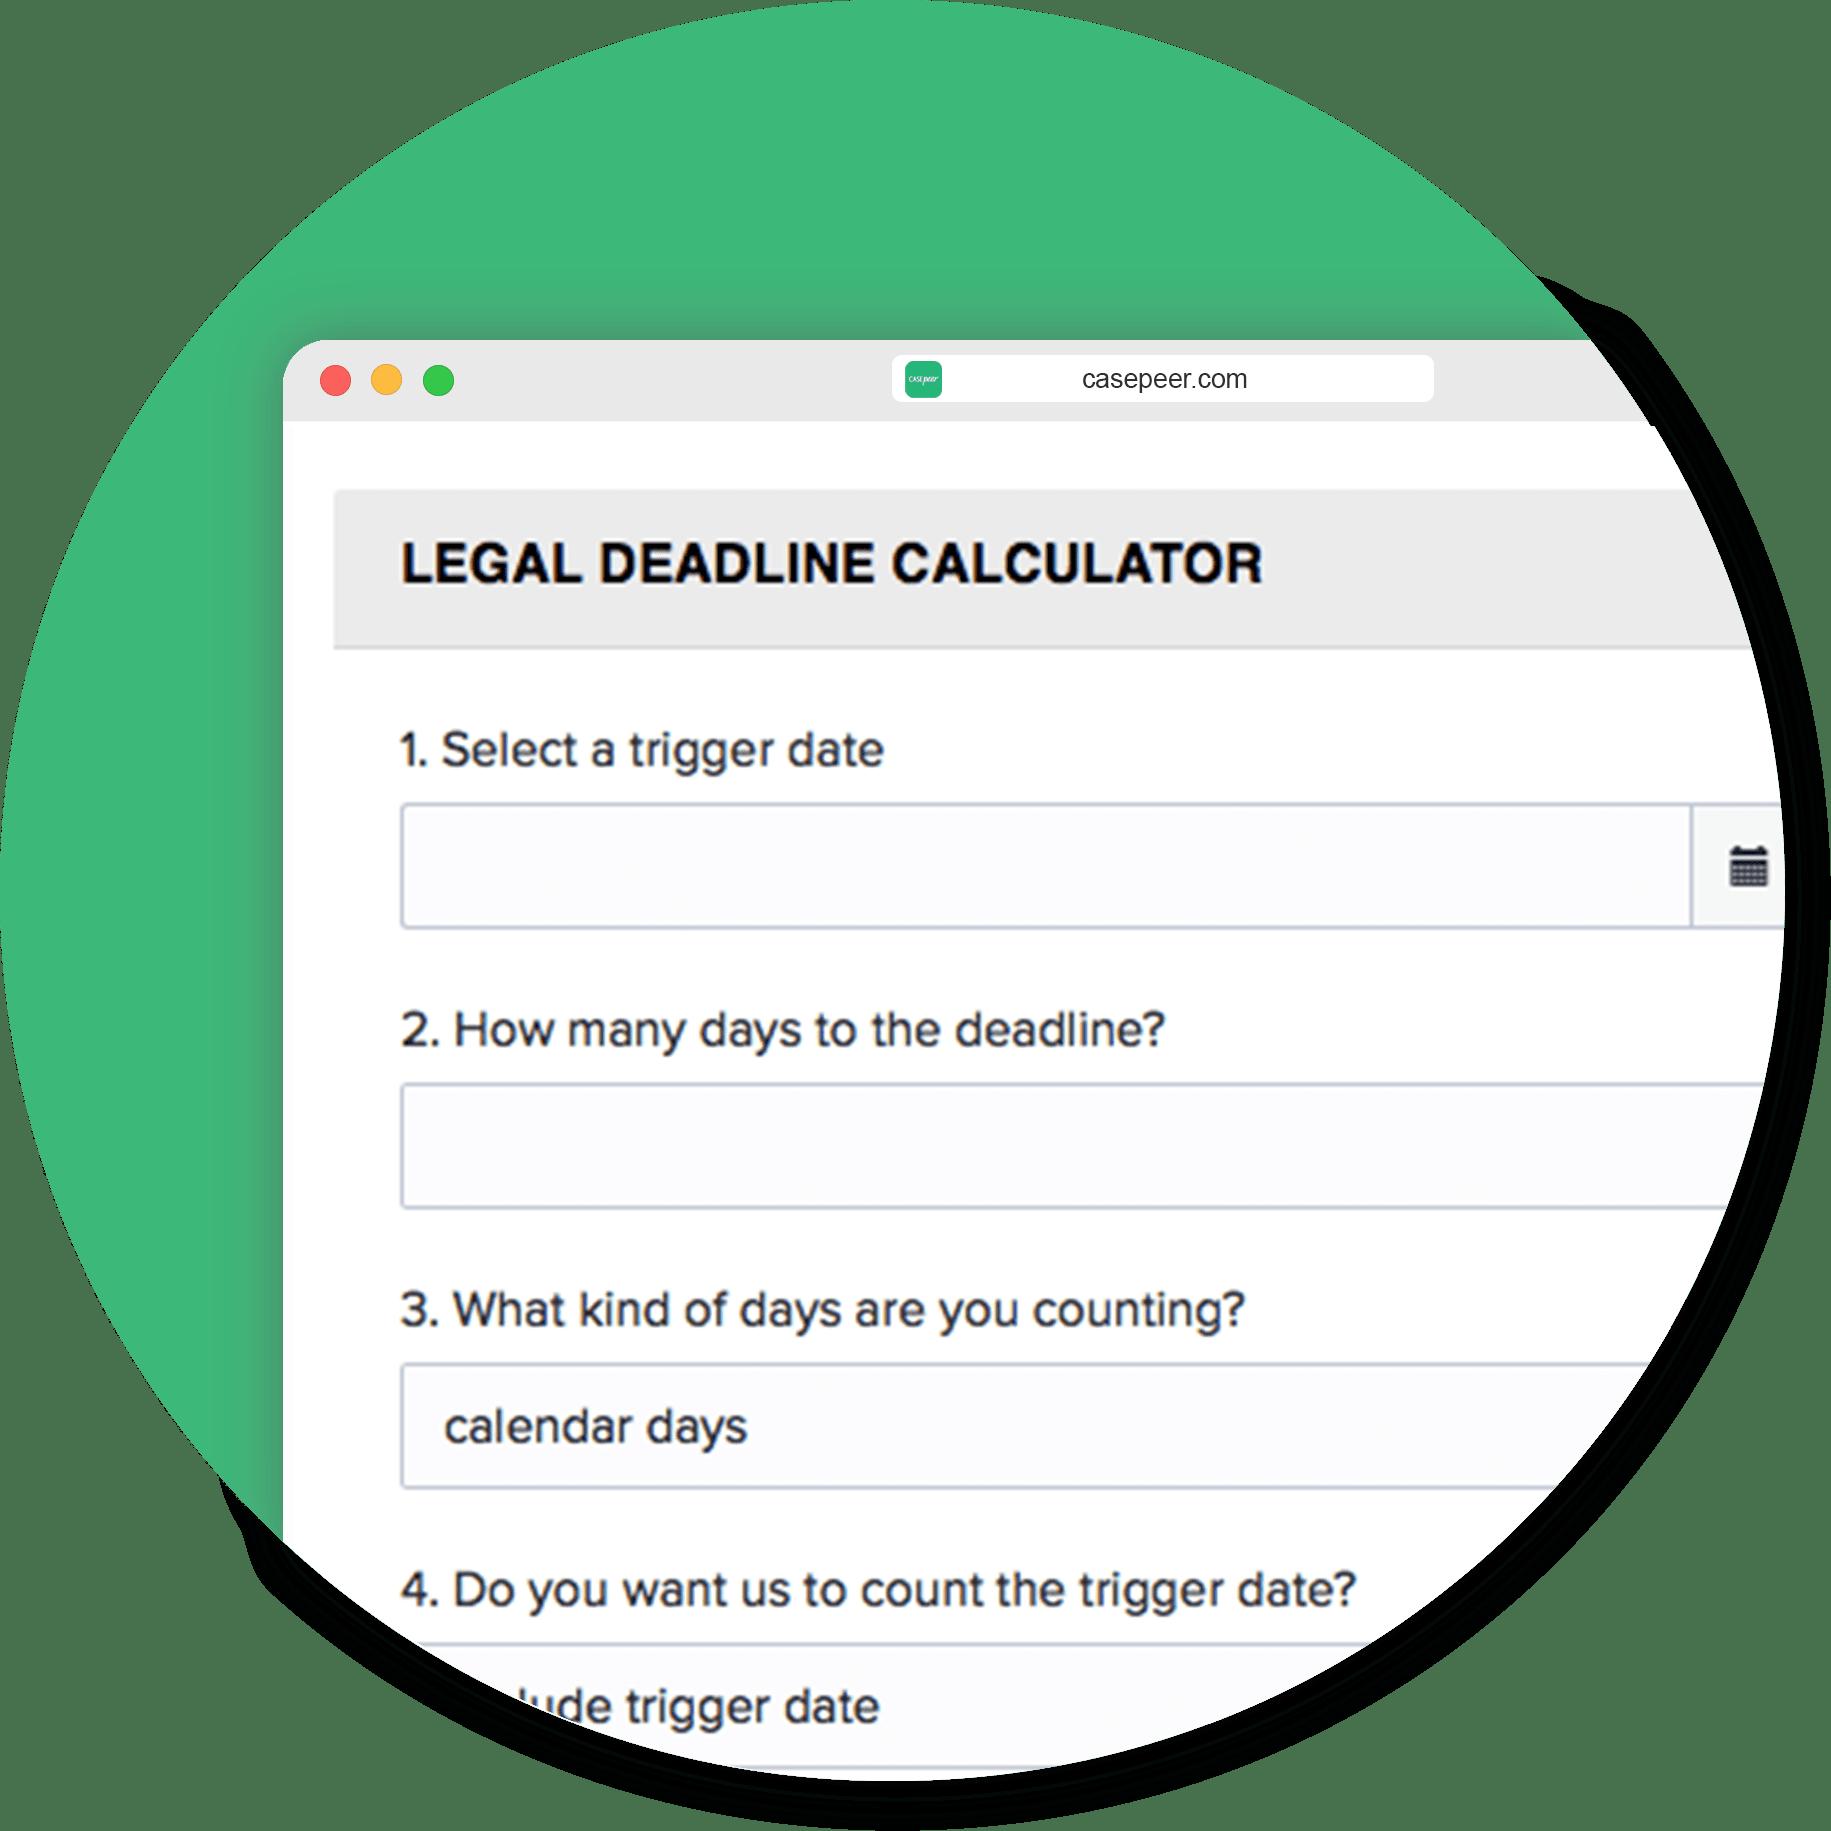 Legal Deadline Calculator